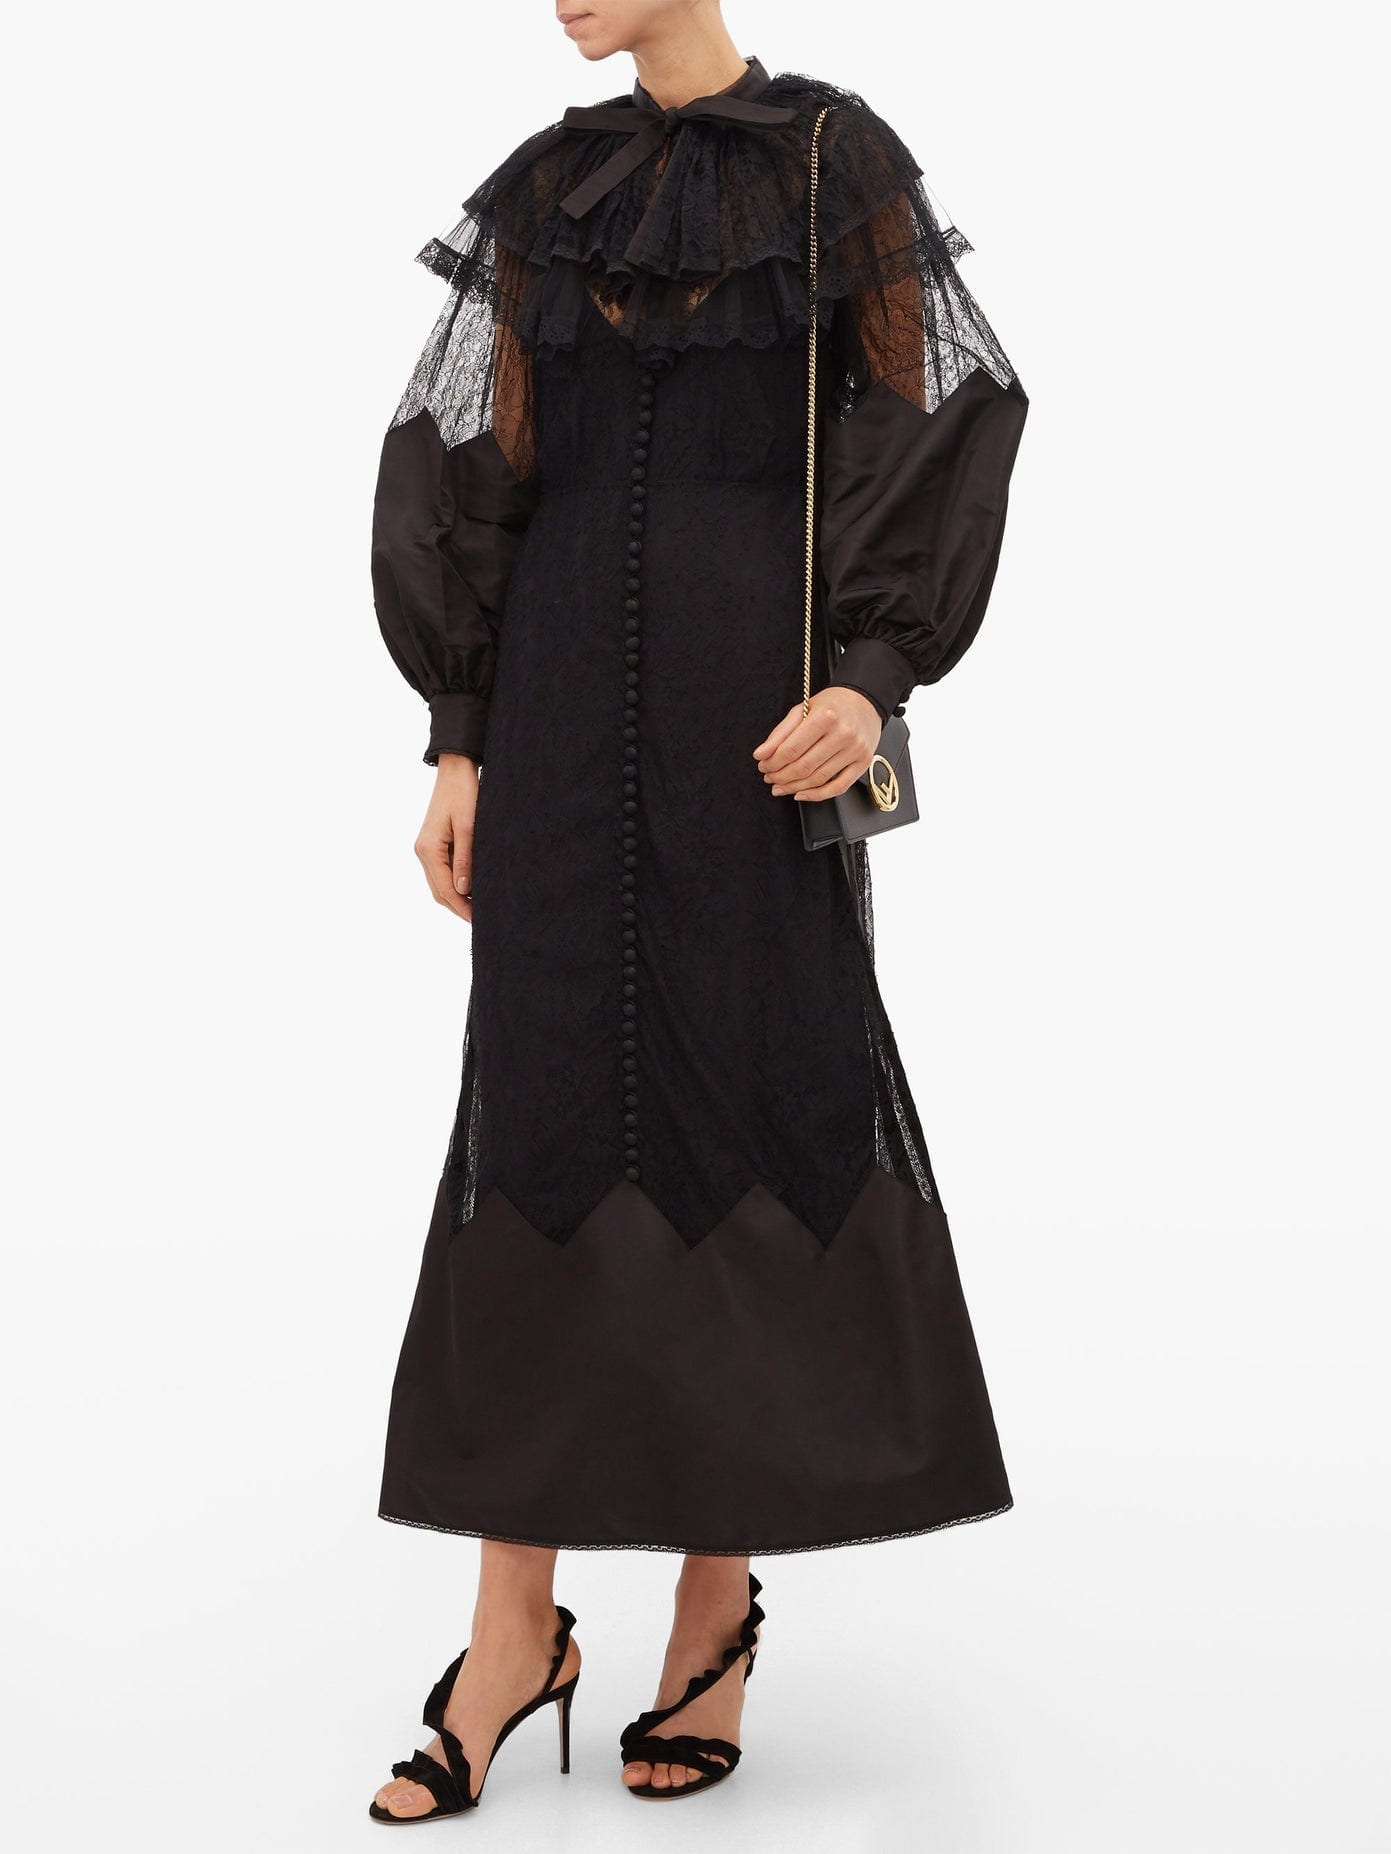 FENDI Ruffled Lace And Taffeta Midi Dress